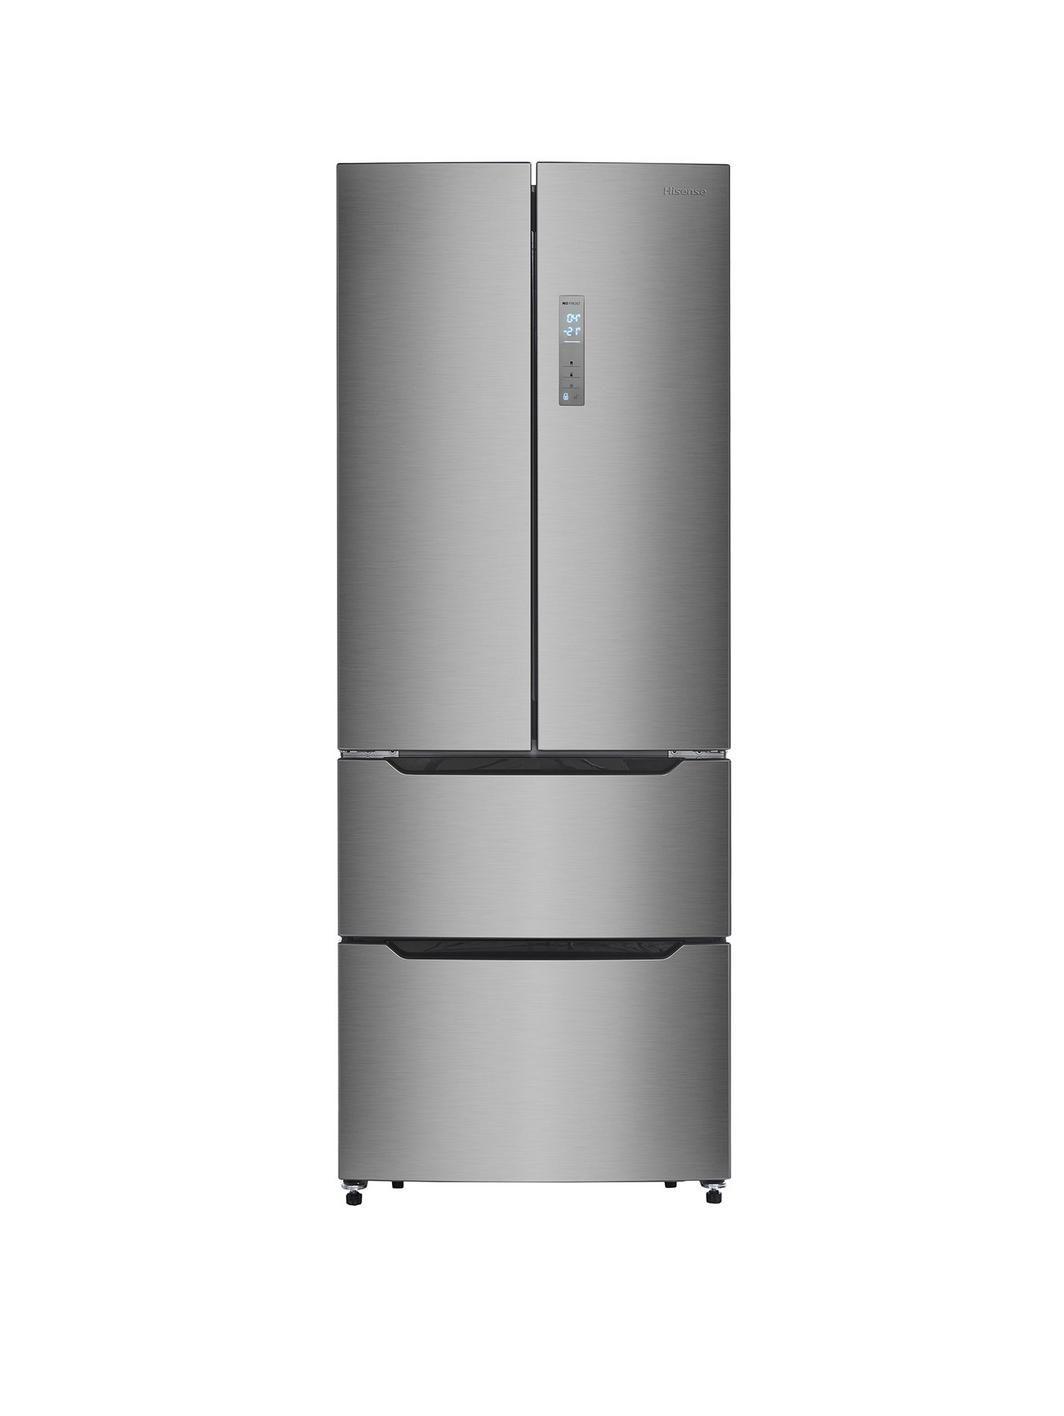 Hisense rf528n4ac1 70cm wide frost free french door style fridge hisense rf528n4ac1 70cm wide frost free french door style fridge freezer stainless steel look rubansaba